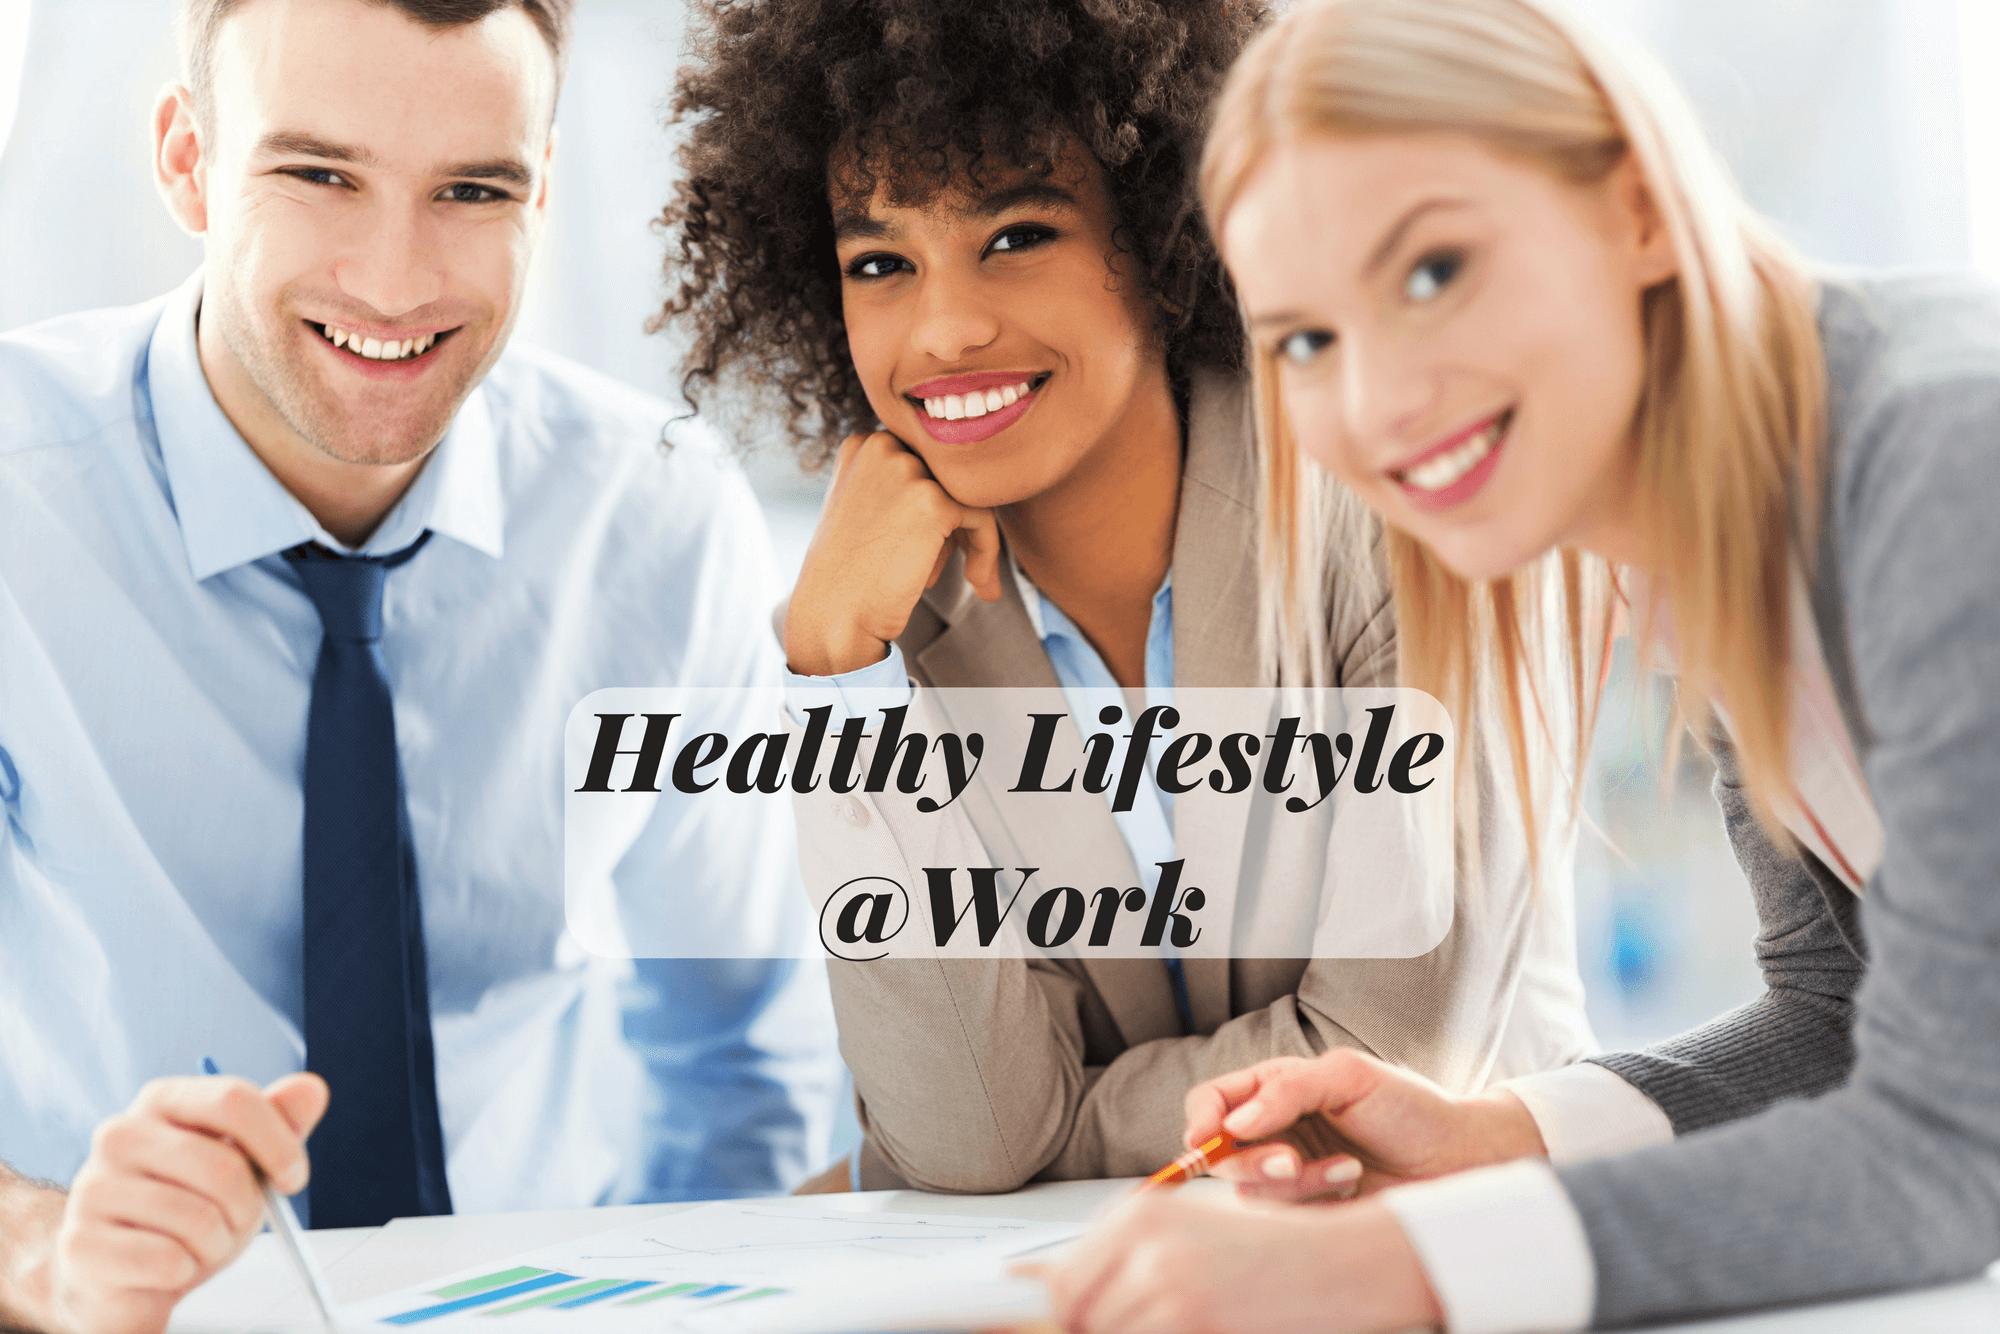 Viva la Vive Viva-la-Vive-Healthy-Lifestyle-at-work-op-het-werk-Vivian-Acquah Healthy Lifestyle @ Work    %site_name, %name, %title, tegory, Vivian Acquah, Nutrition Advocate